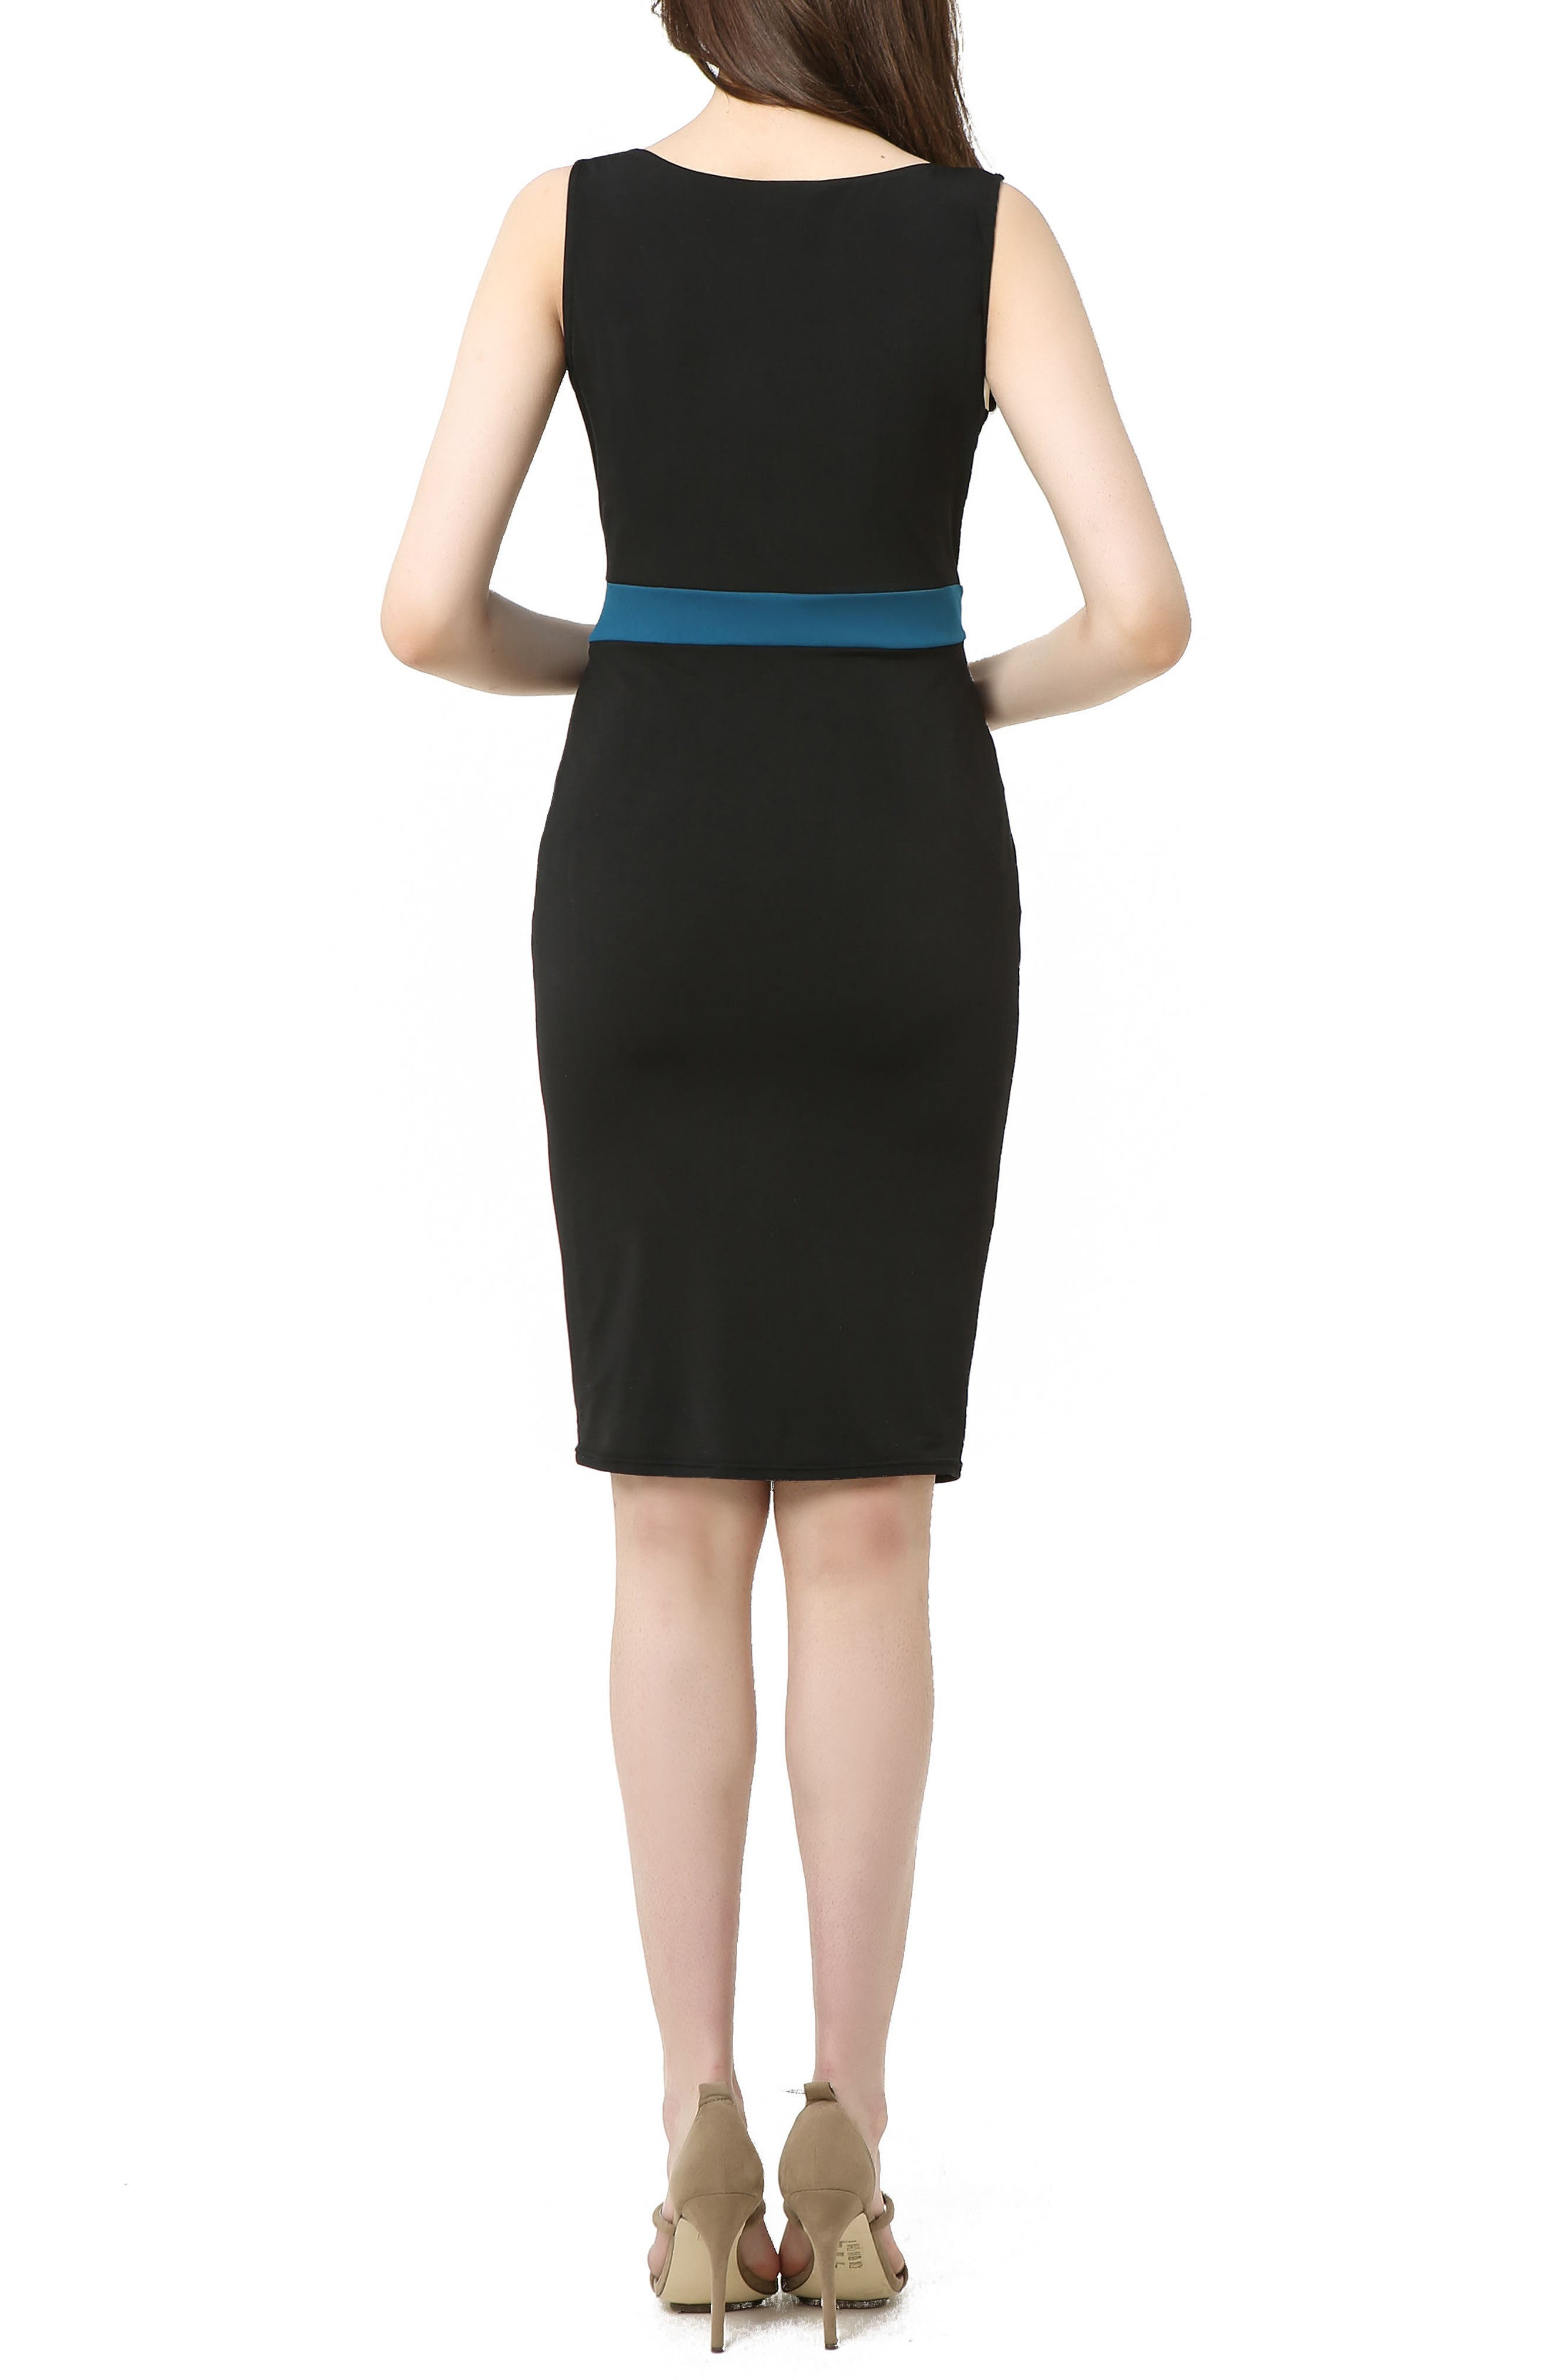 Sophia Colorblock Body-Con Maternity Dress,                             Alternate thumbnail 2, color,                             BLACK/ DEEP SEA